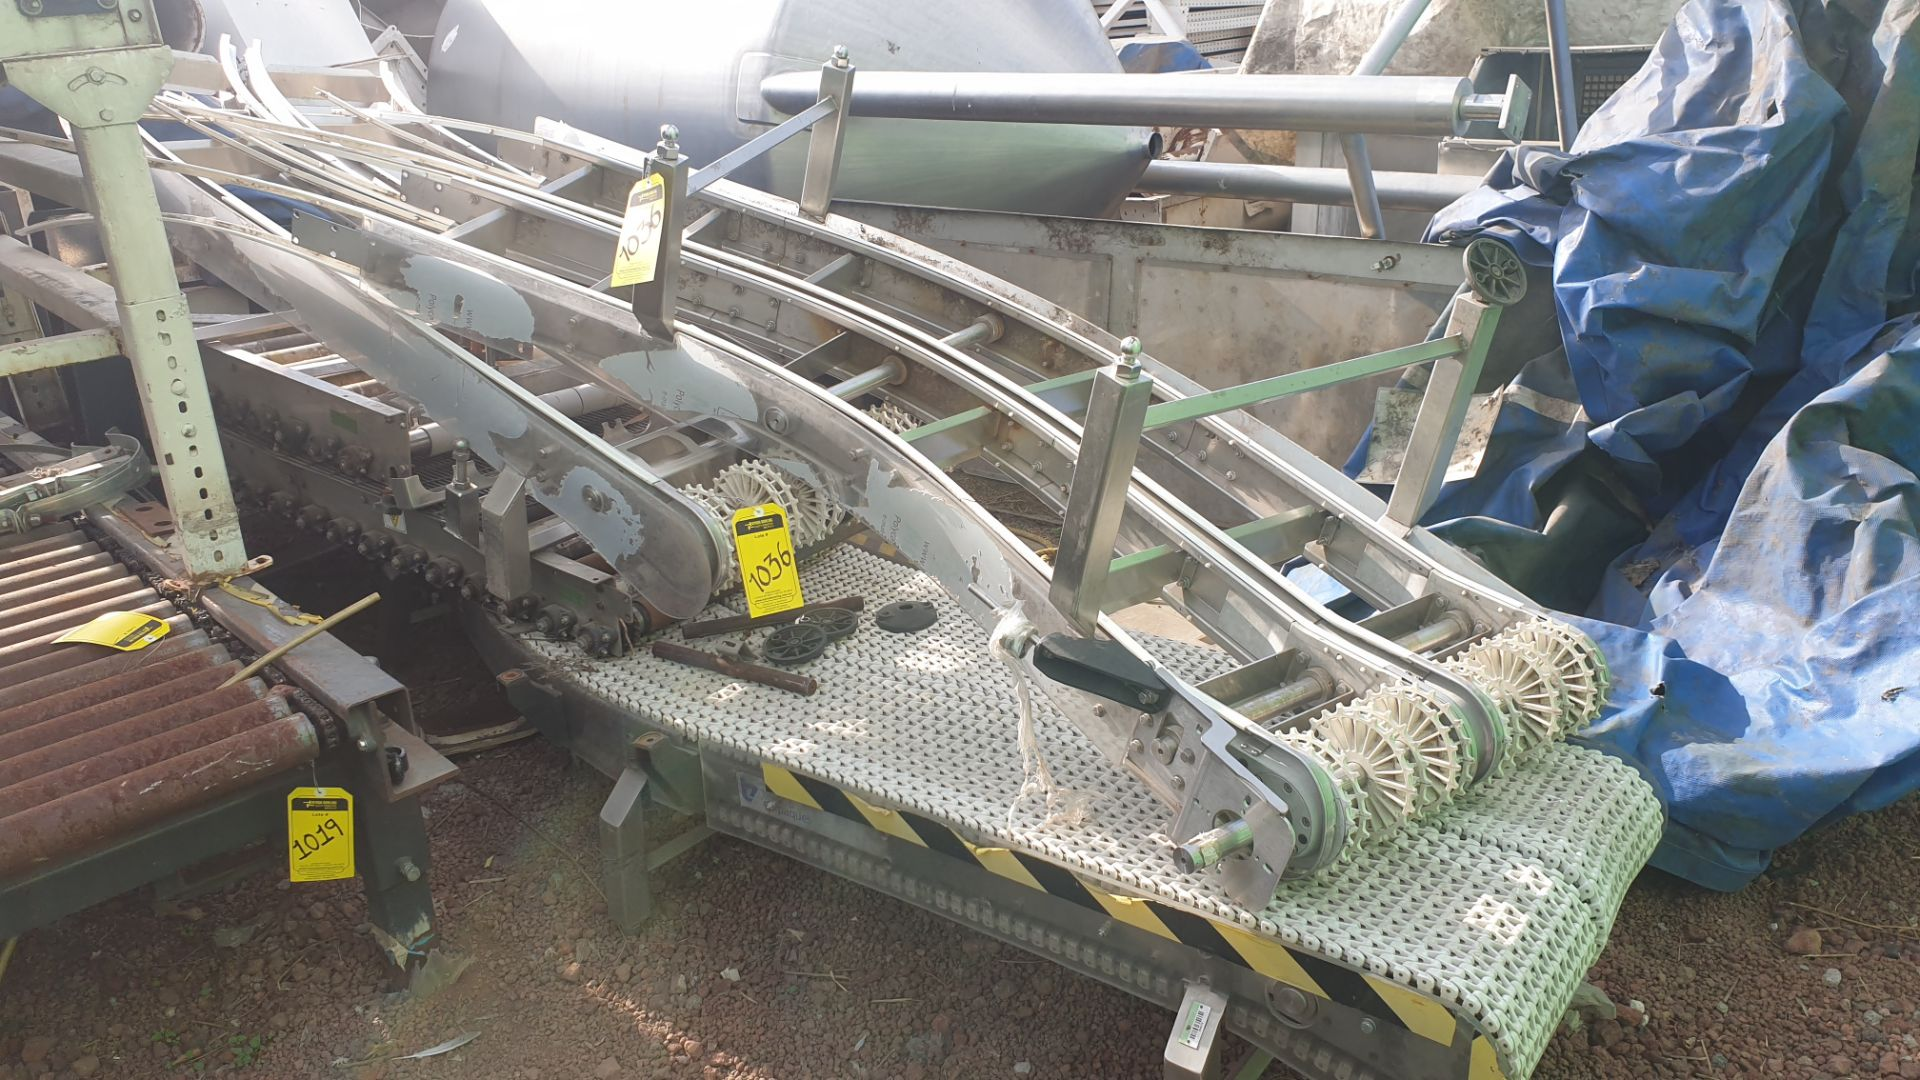 S conveyor belt batch. Please inspect - Image 2 of 9